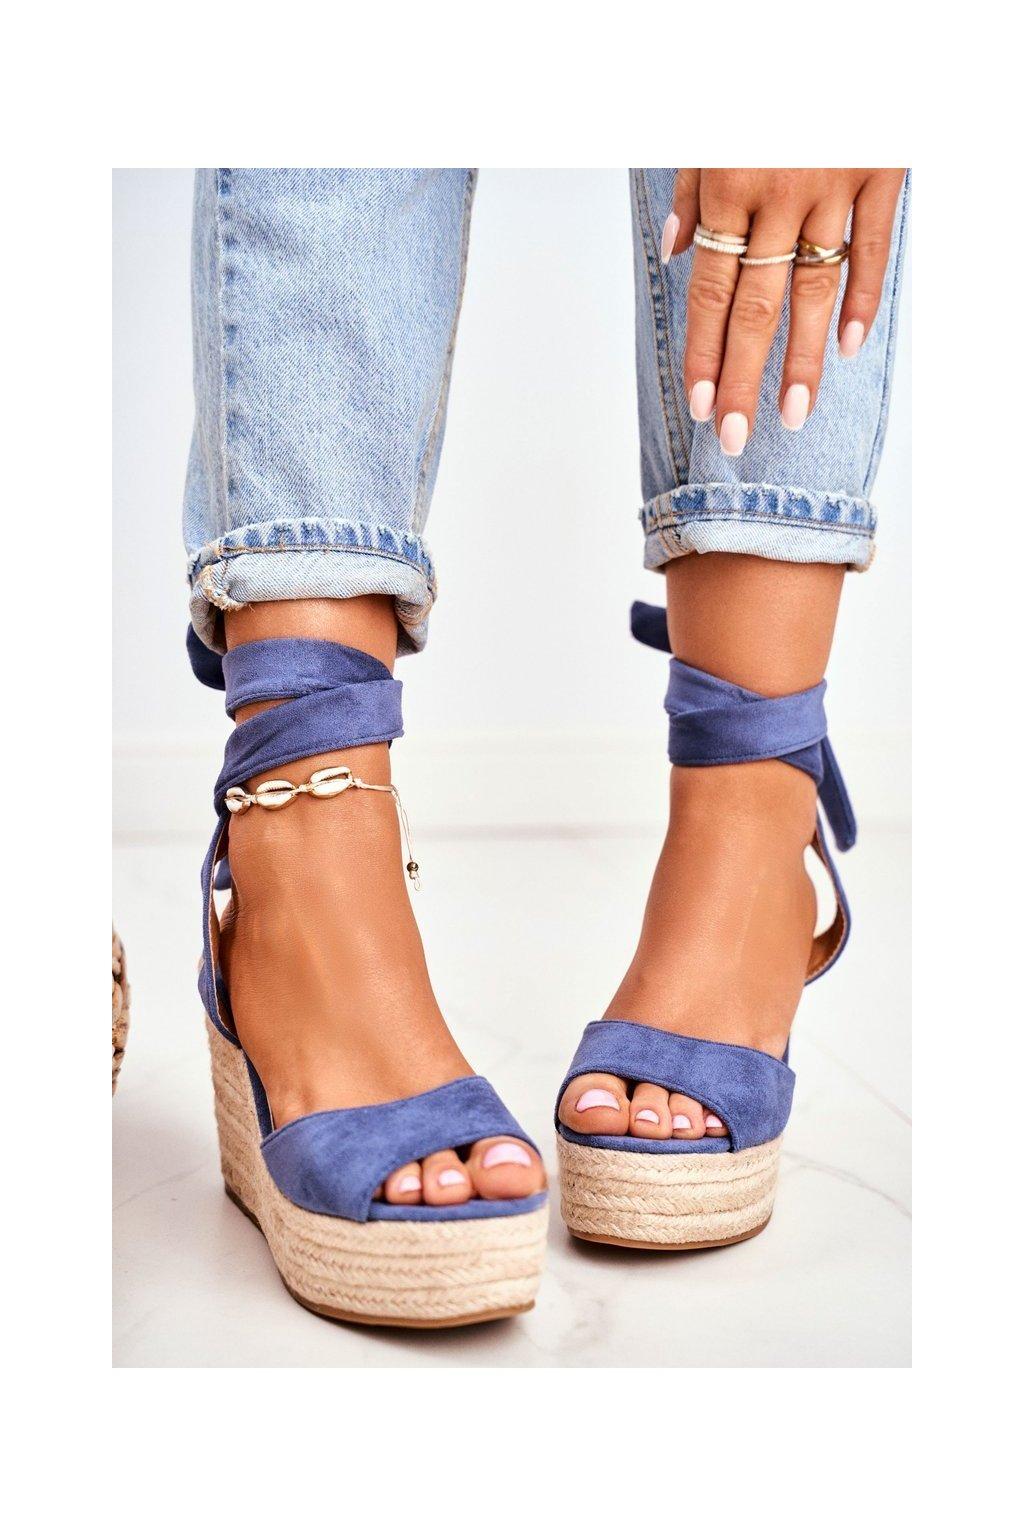 Dámske Sandále na platforme modré Ollie